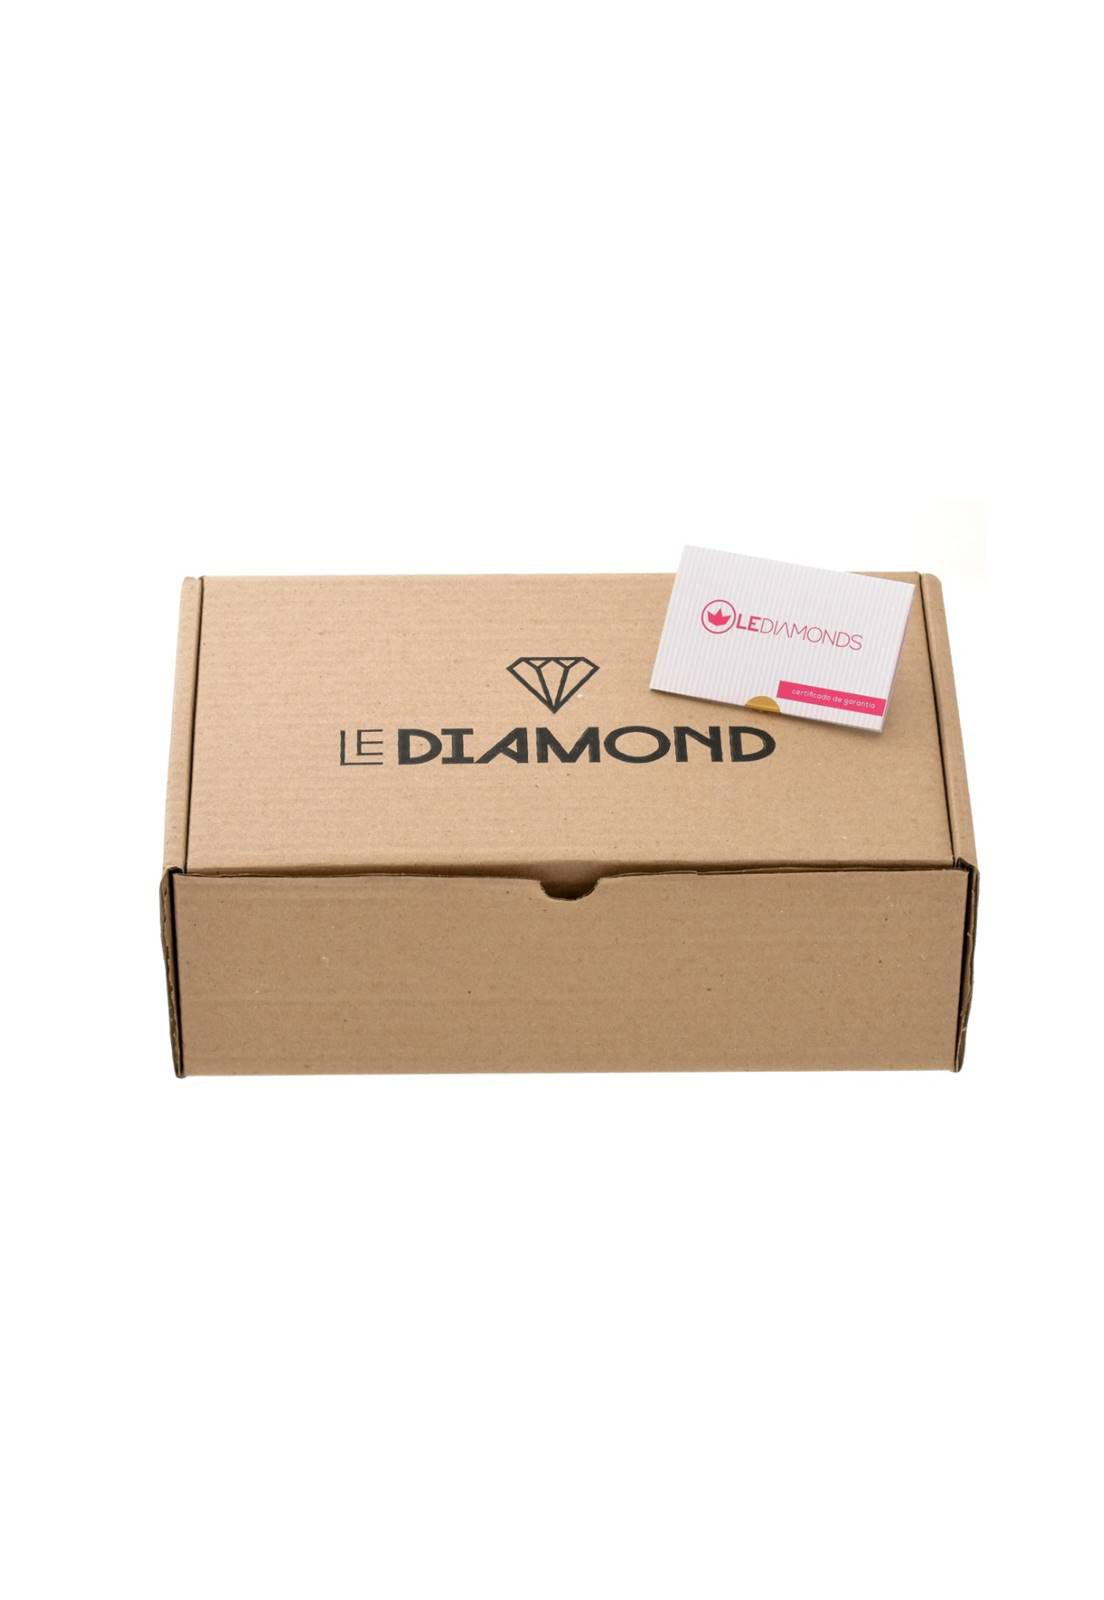 Colar Le Diamond Duplo com Navete de Cristal Dourado